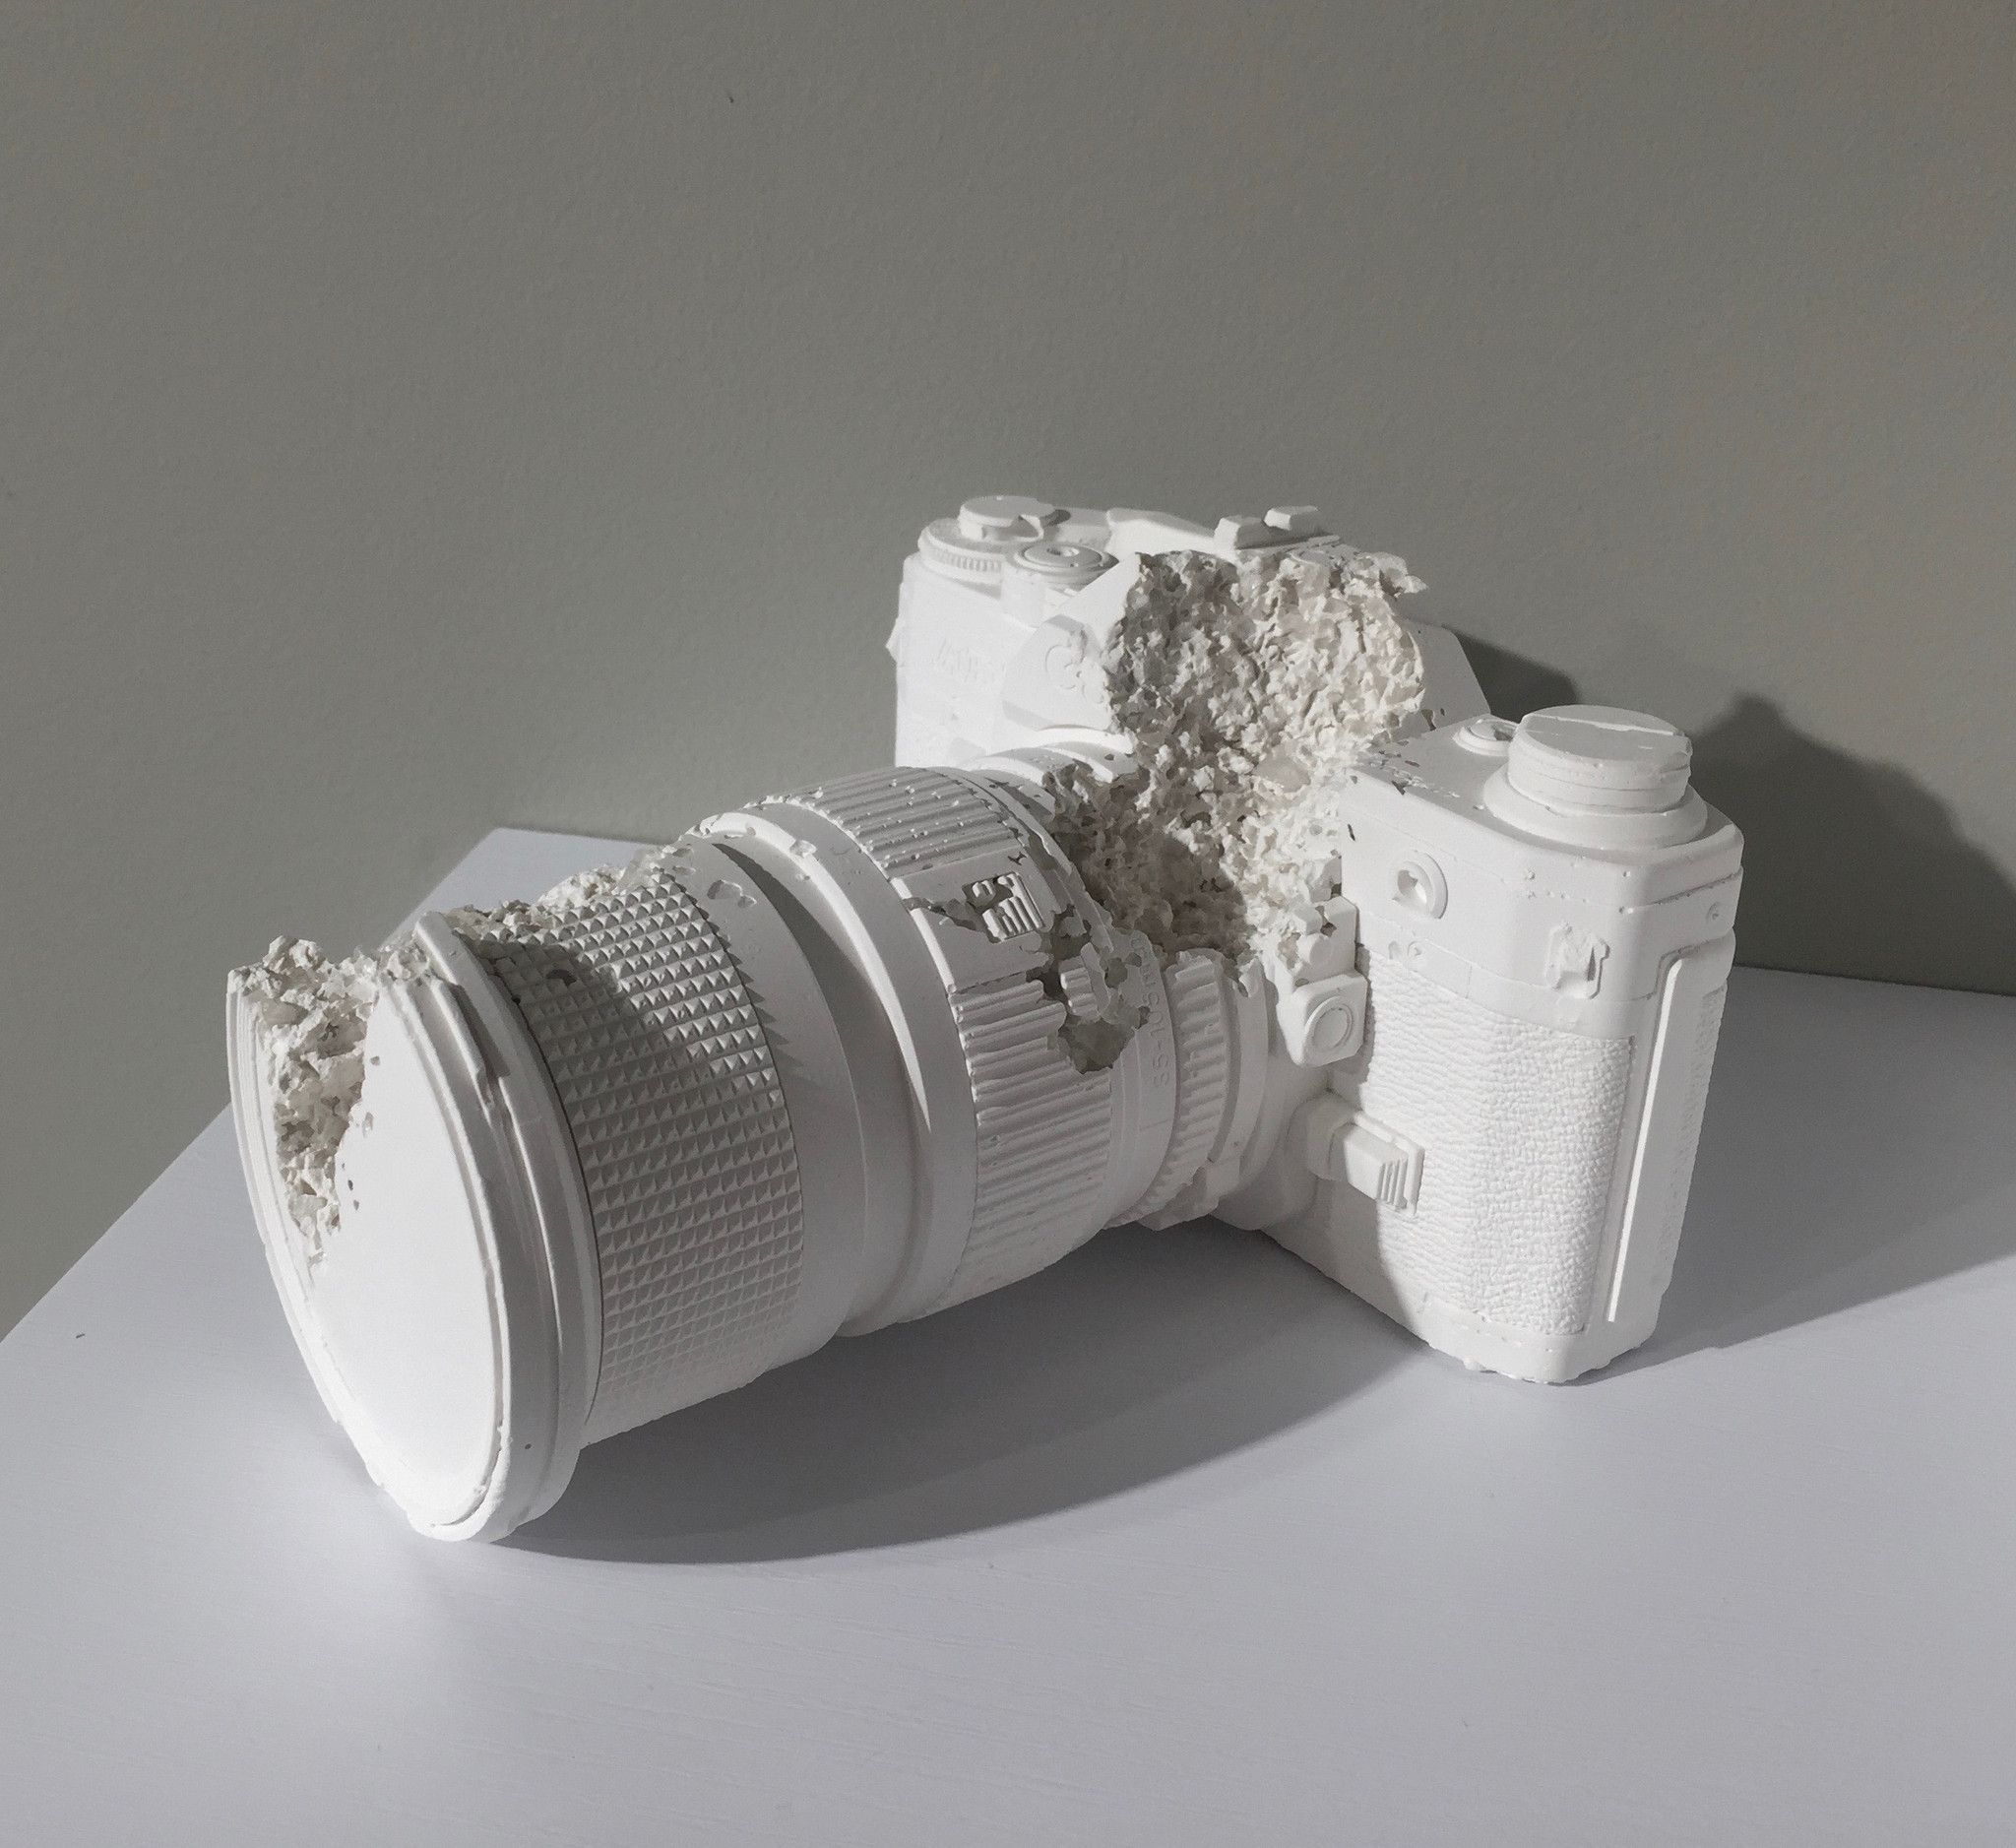 "Daniel Arsham Future Relic 02 (Camera), 2014 Edition of 450 Medium: Plaster and Broken Glass Dimensions: 5.75"" x 6.25"" x 3.75"""